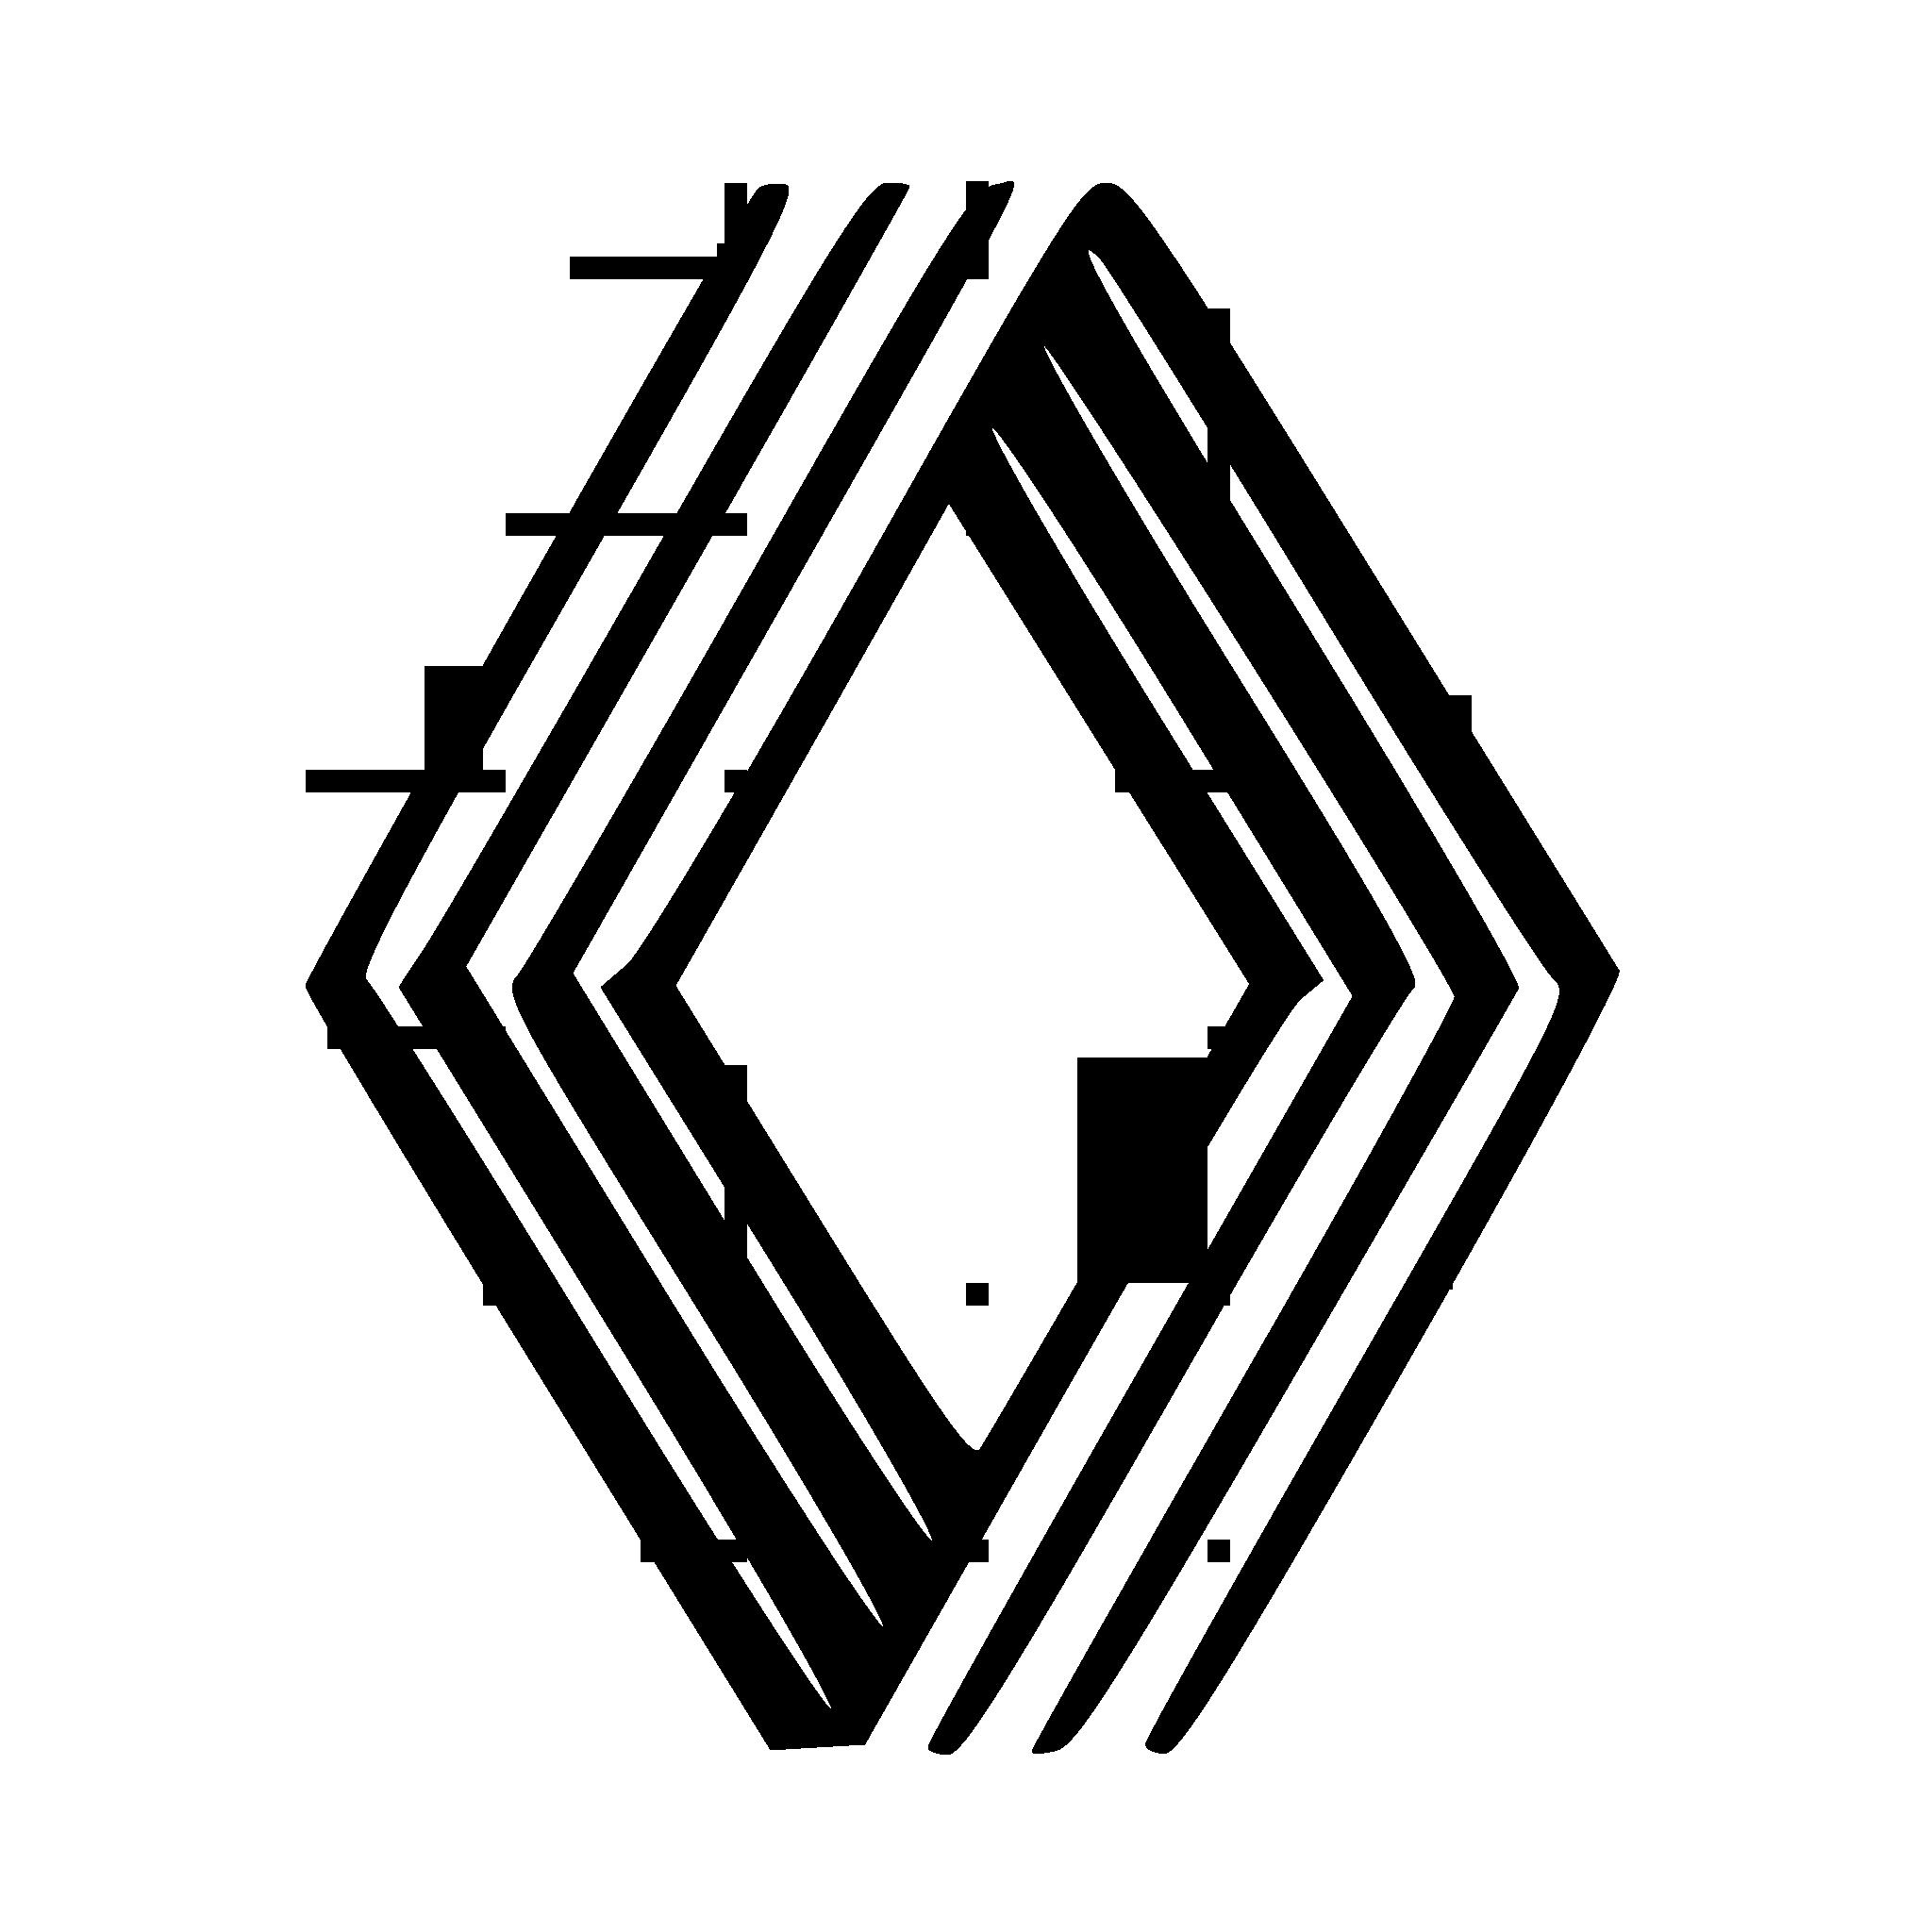 Renault Logo (1972) 2048X2048 Hd Png - Renault, Transparent background PNG HD thumbnail